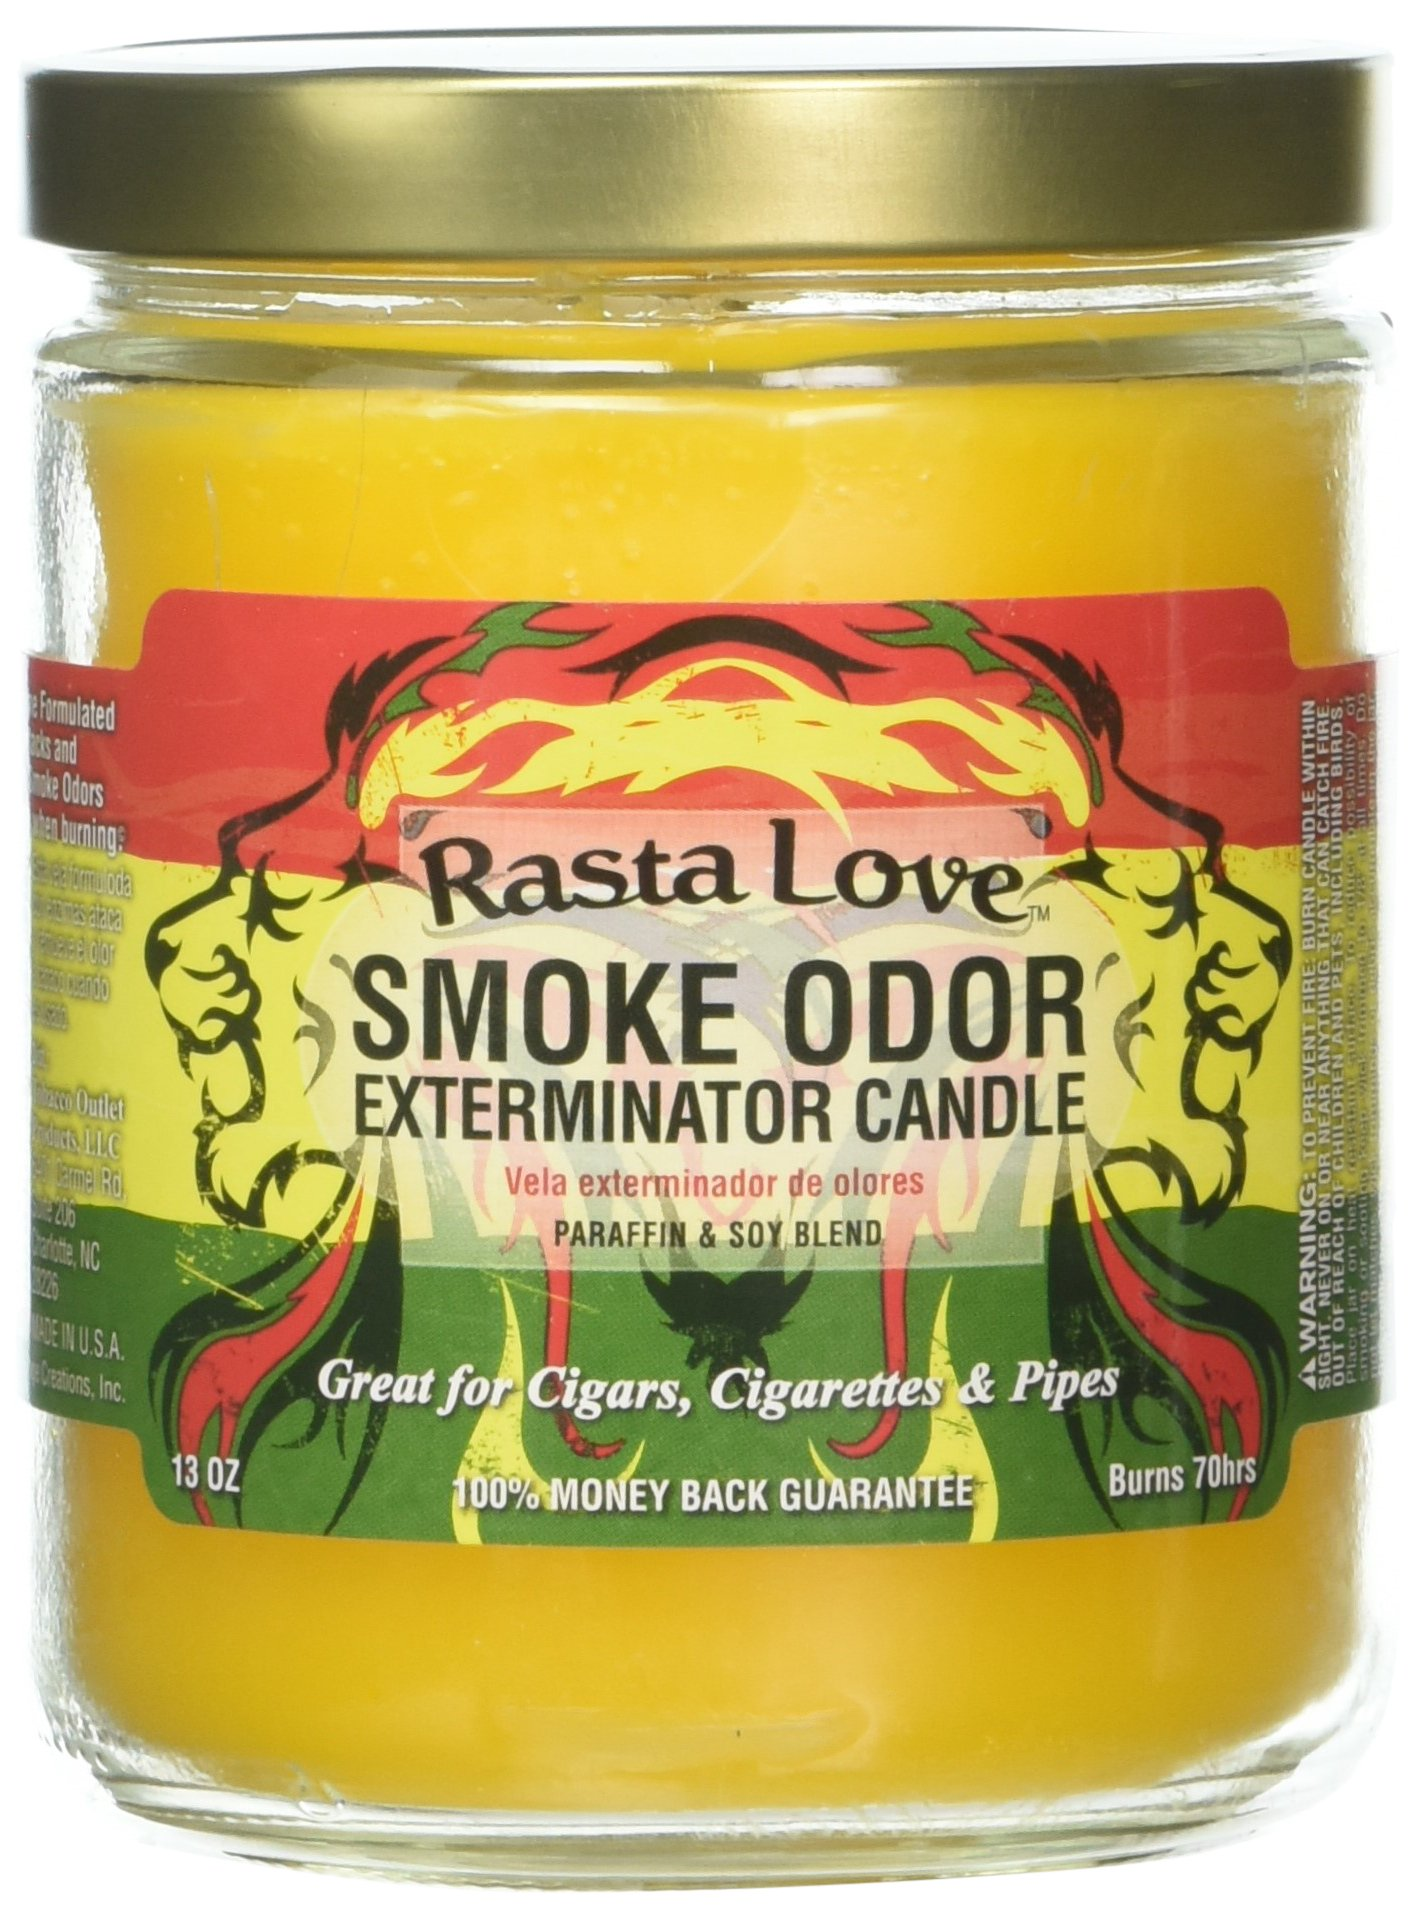 Smoke Odor Exterminator 13oz Jar Candle, Rasta Love